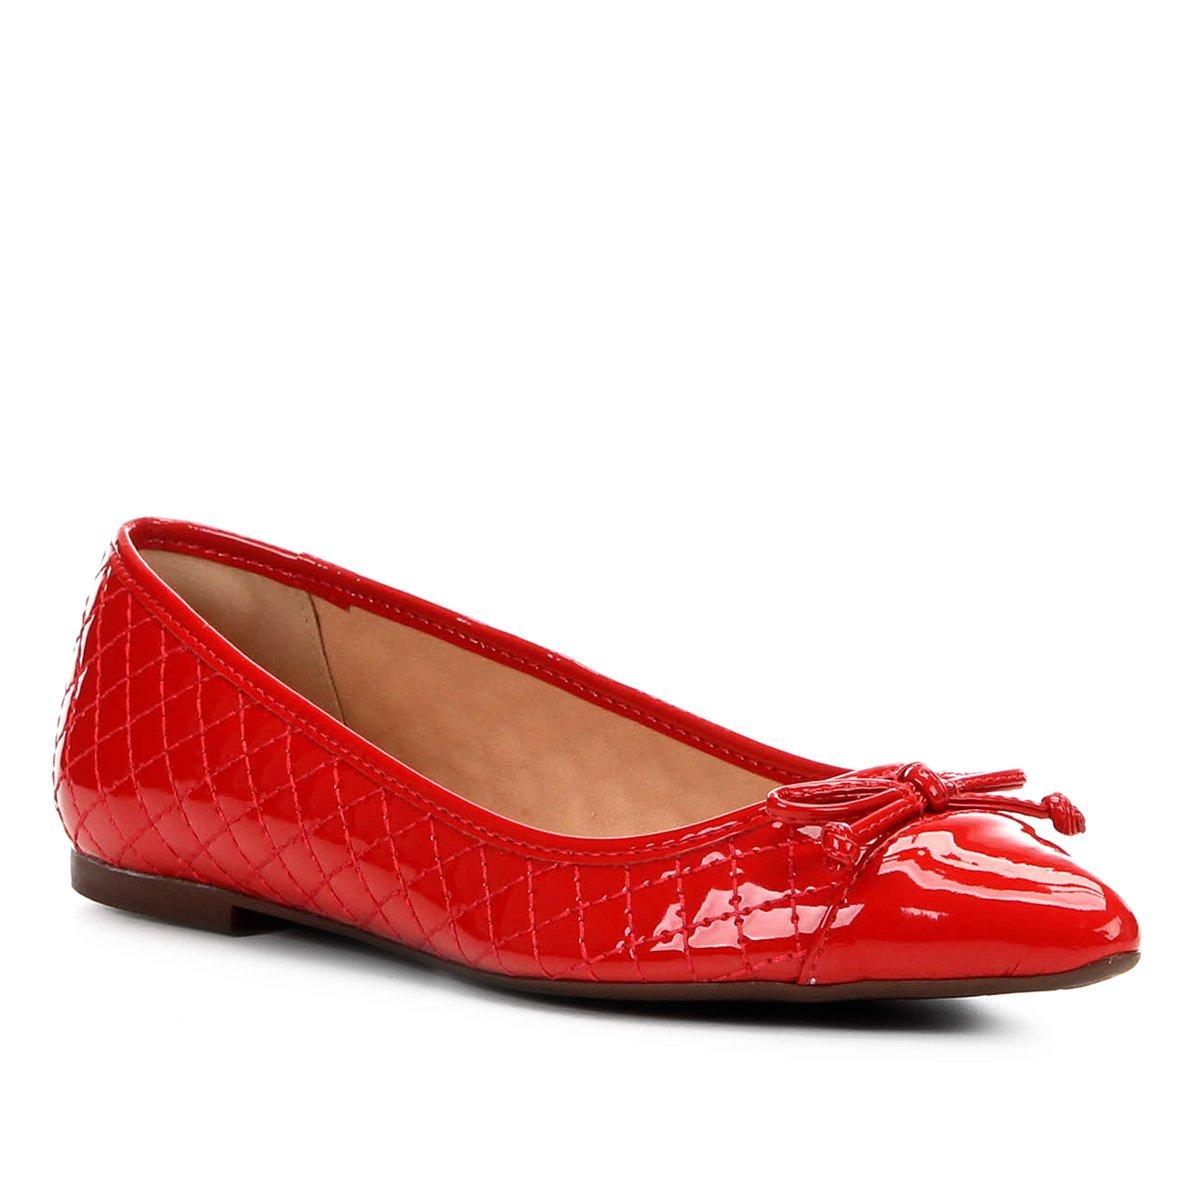 d37ee6515 Sapatilha Shoestock Matelassê Bico Fino Laço Feminina